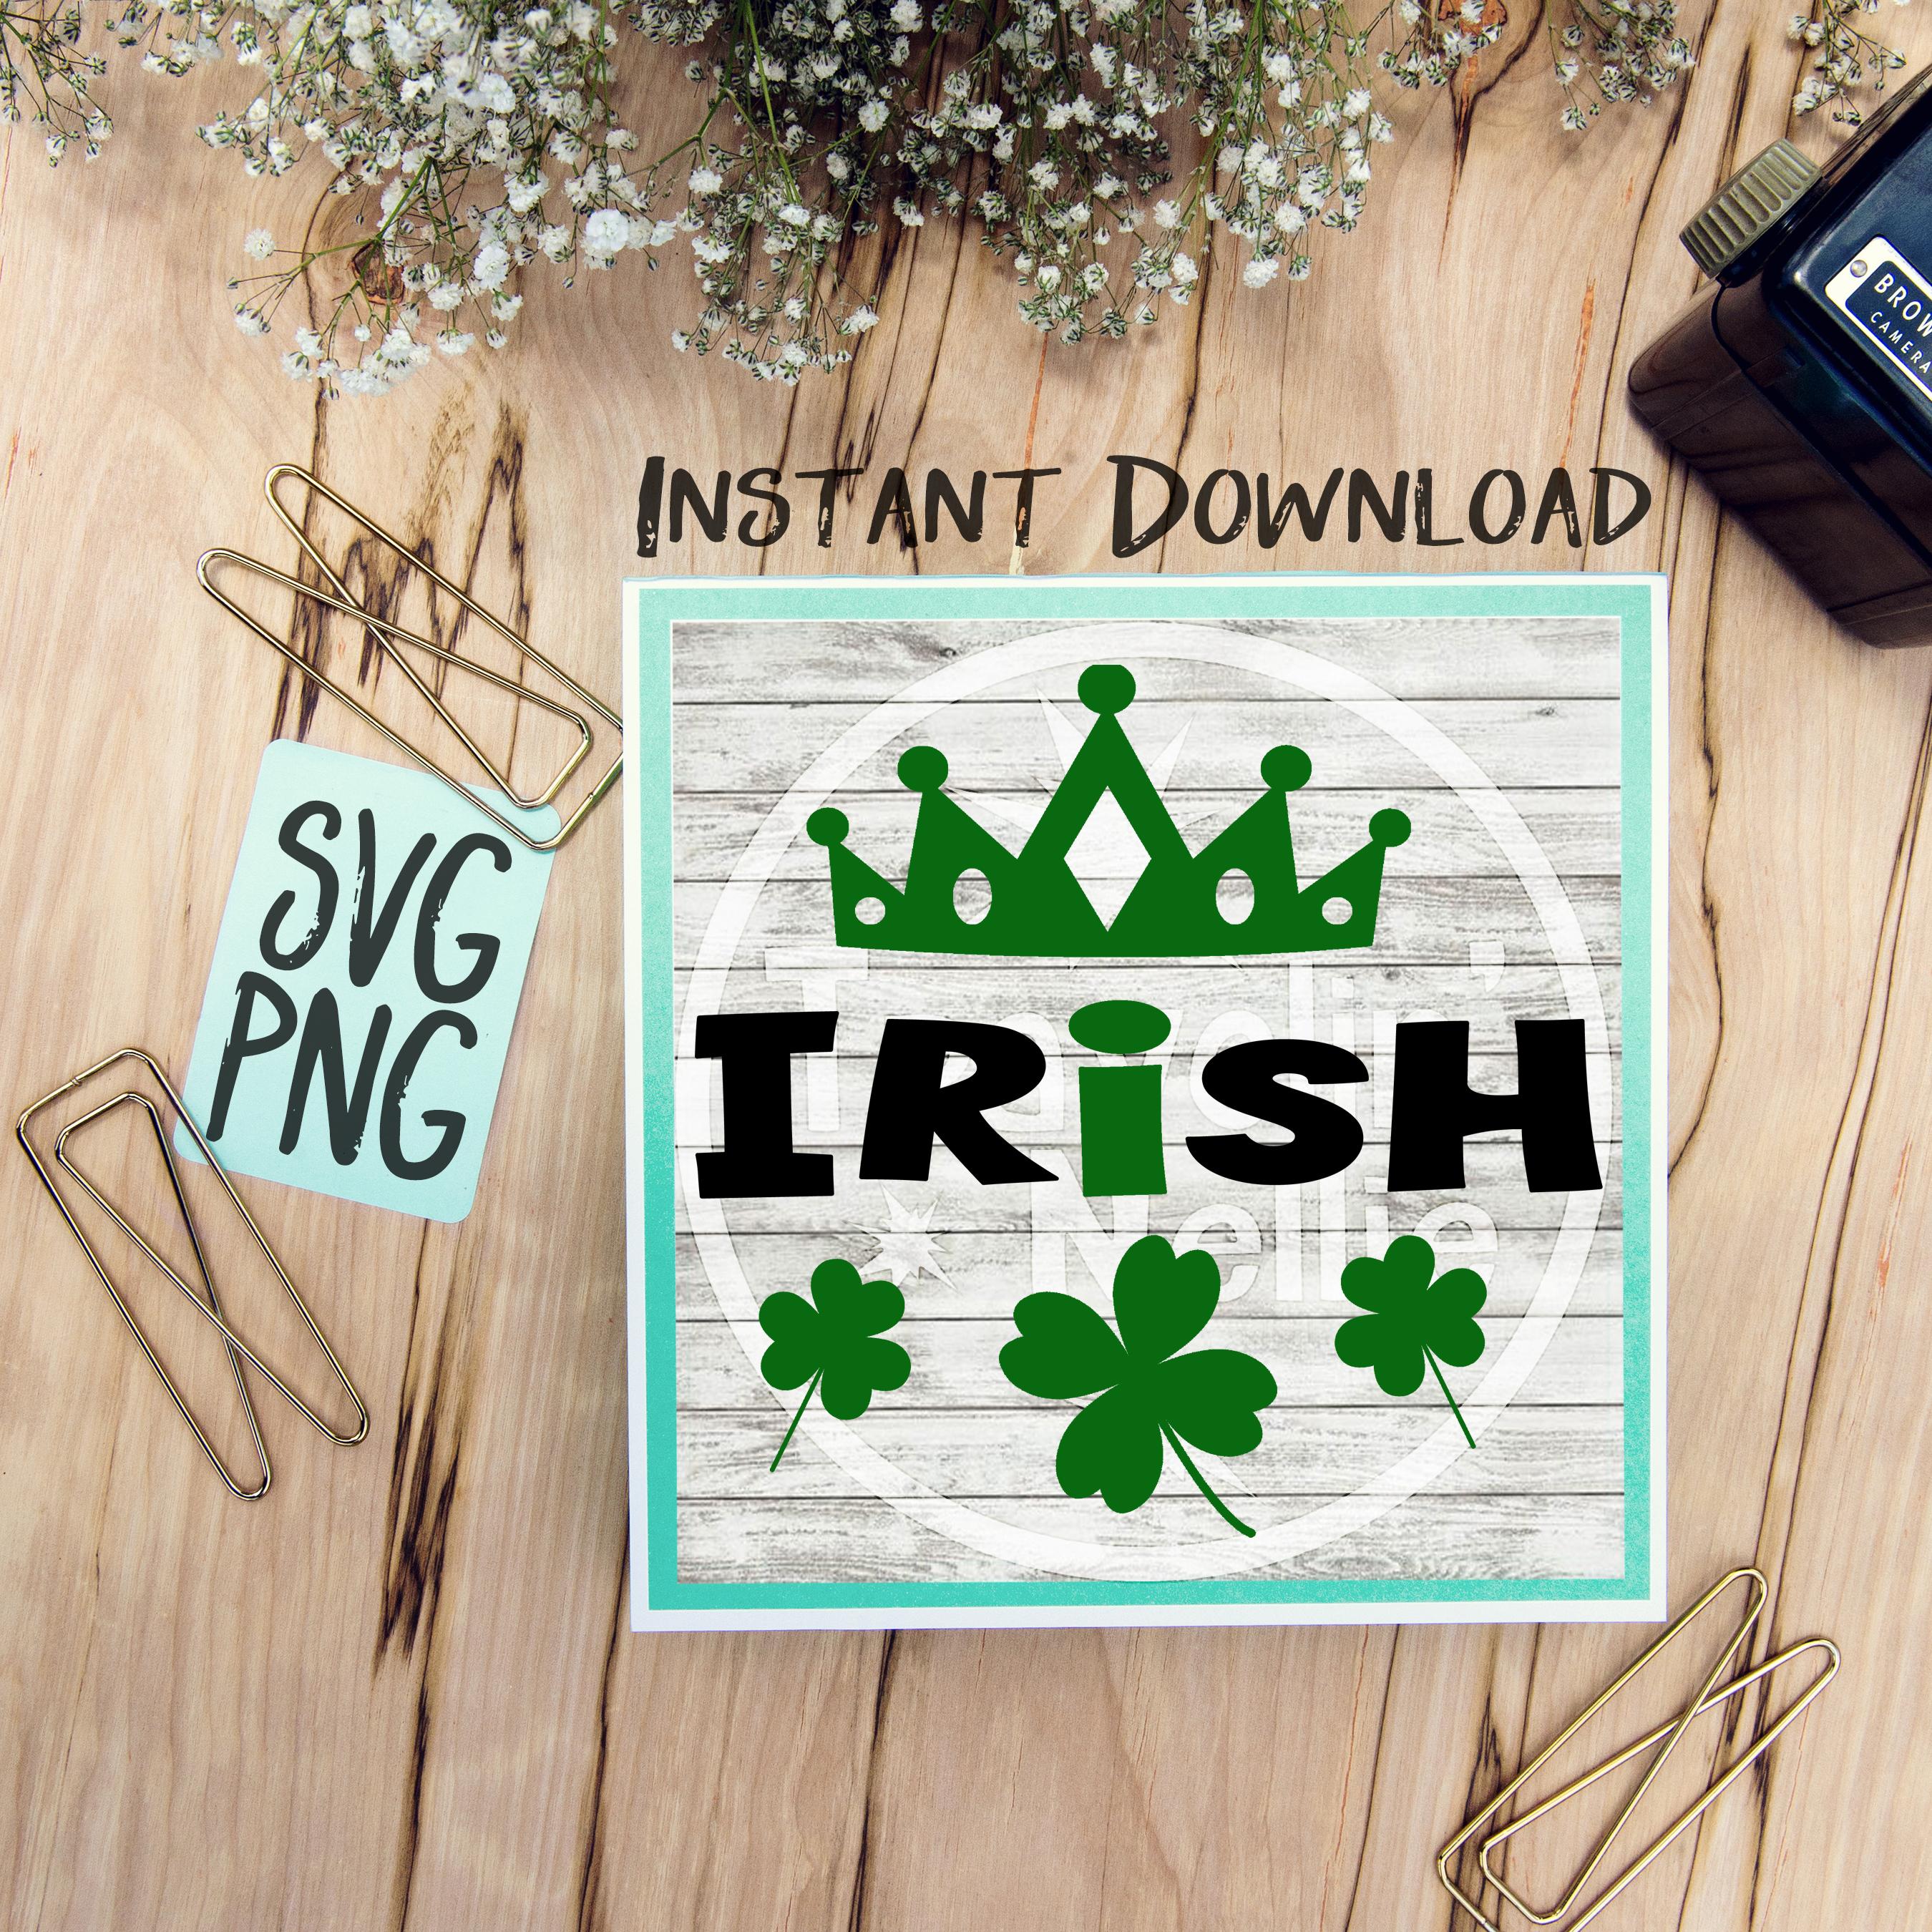 Irish Princess SVG PNG Image Design for Cut Machines Print DIY Design Brother Cricut Cameo Cutout St. Patrick's Day Irish Clover Lucky example image 1